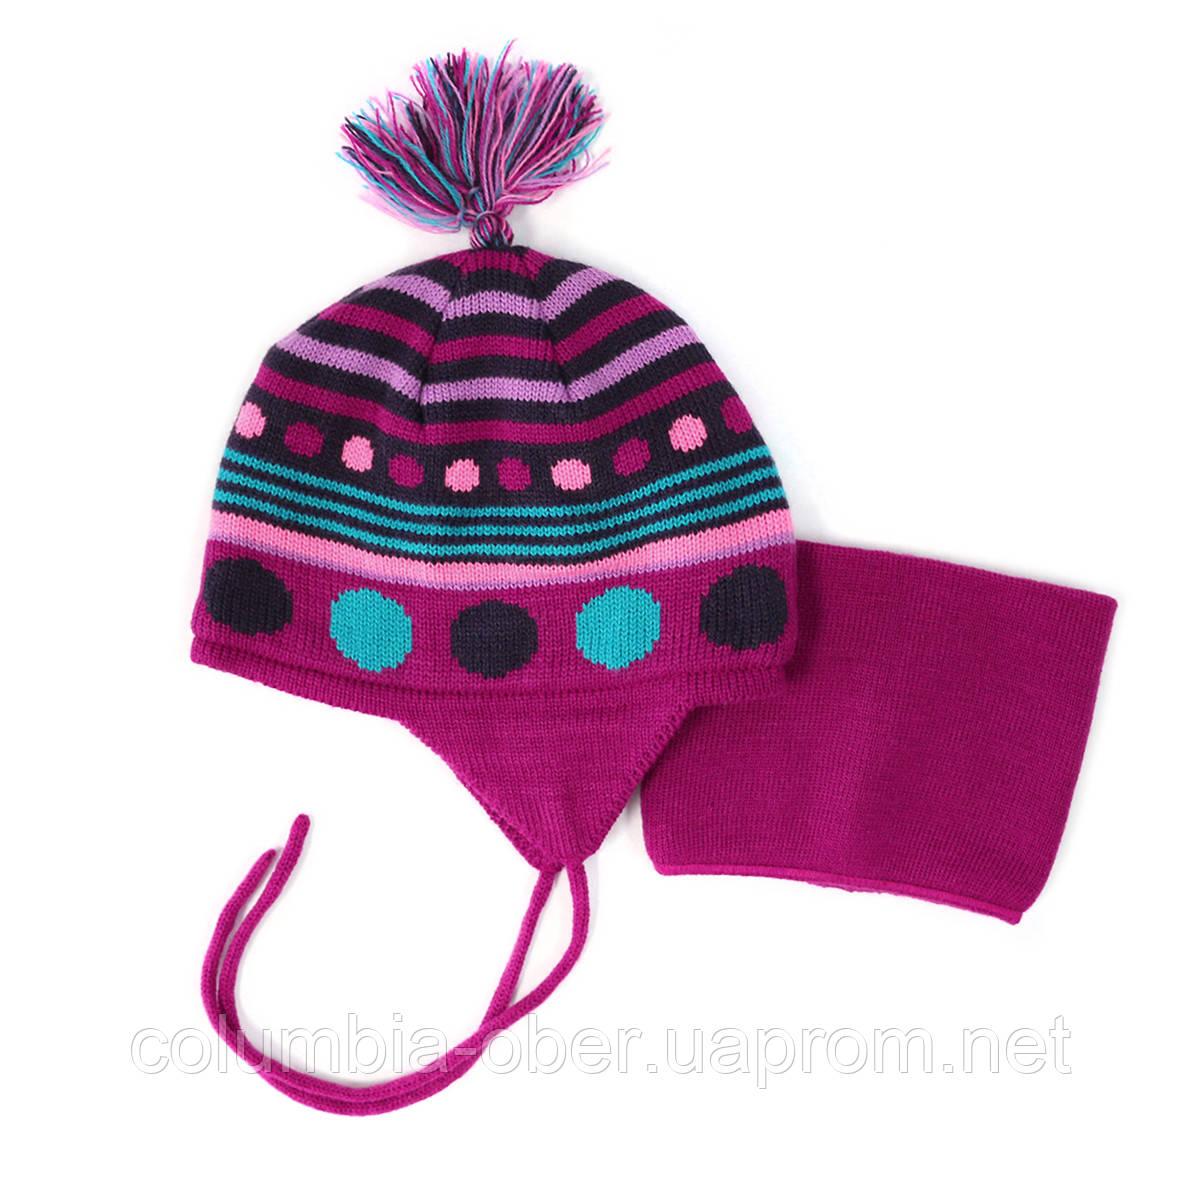 Зимняя шапка+манишка для девочки PELUCHE 32 BF ACC F16. Размер 12/24м и 2/3.